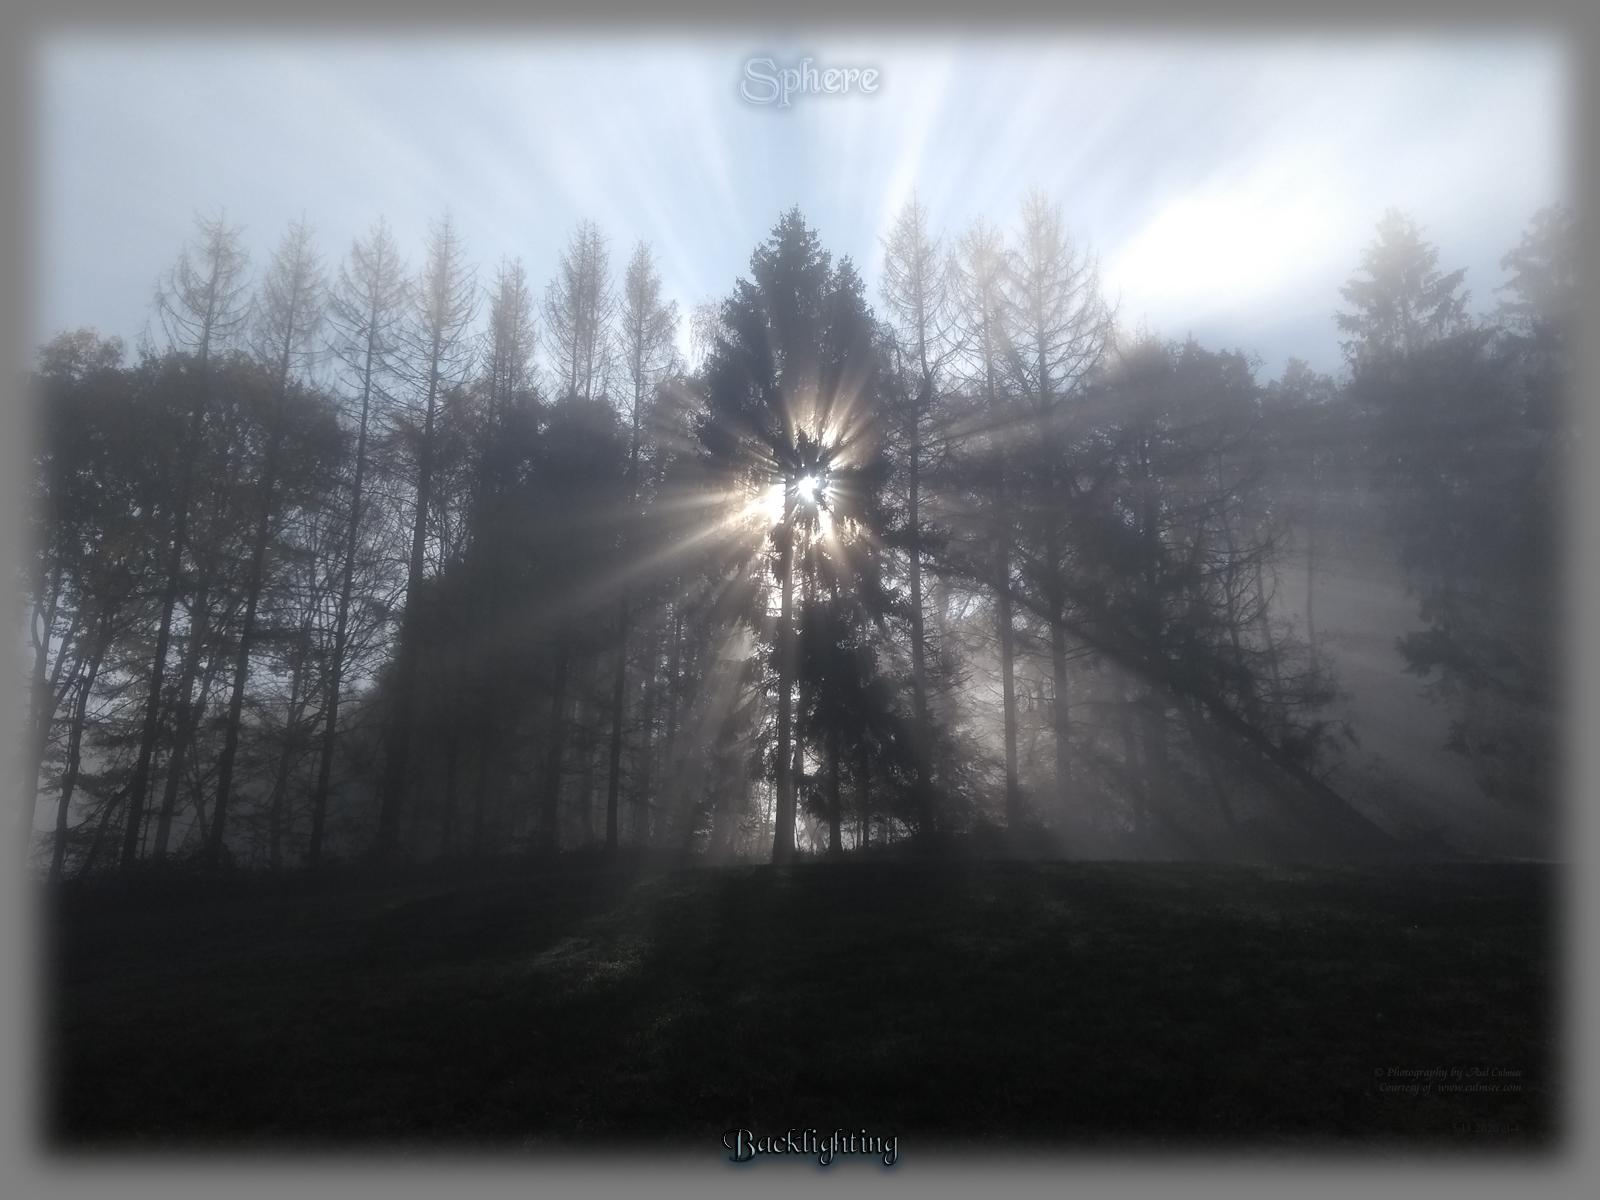 Sphere at Western Forest - November 2020